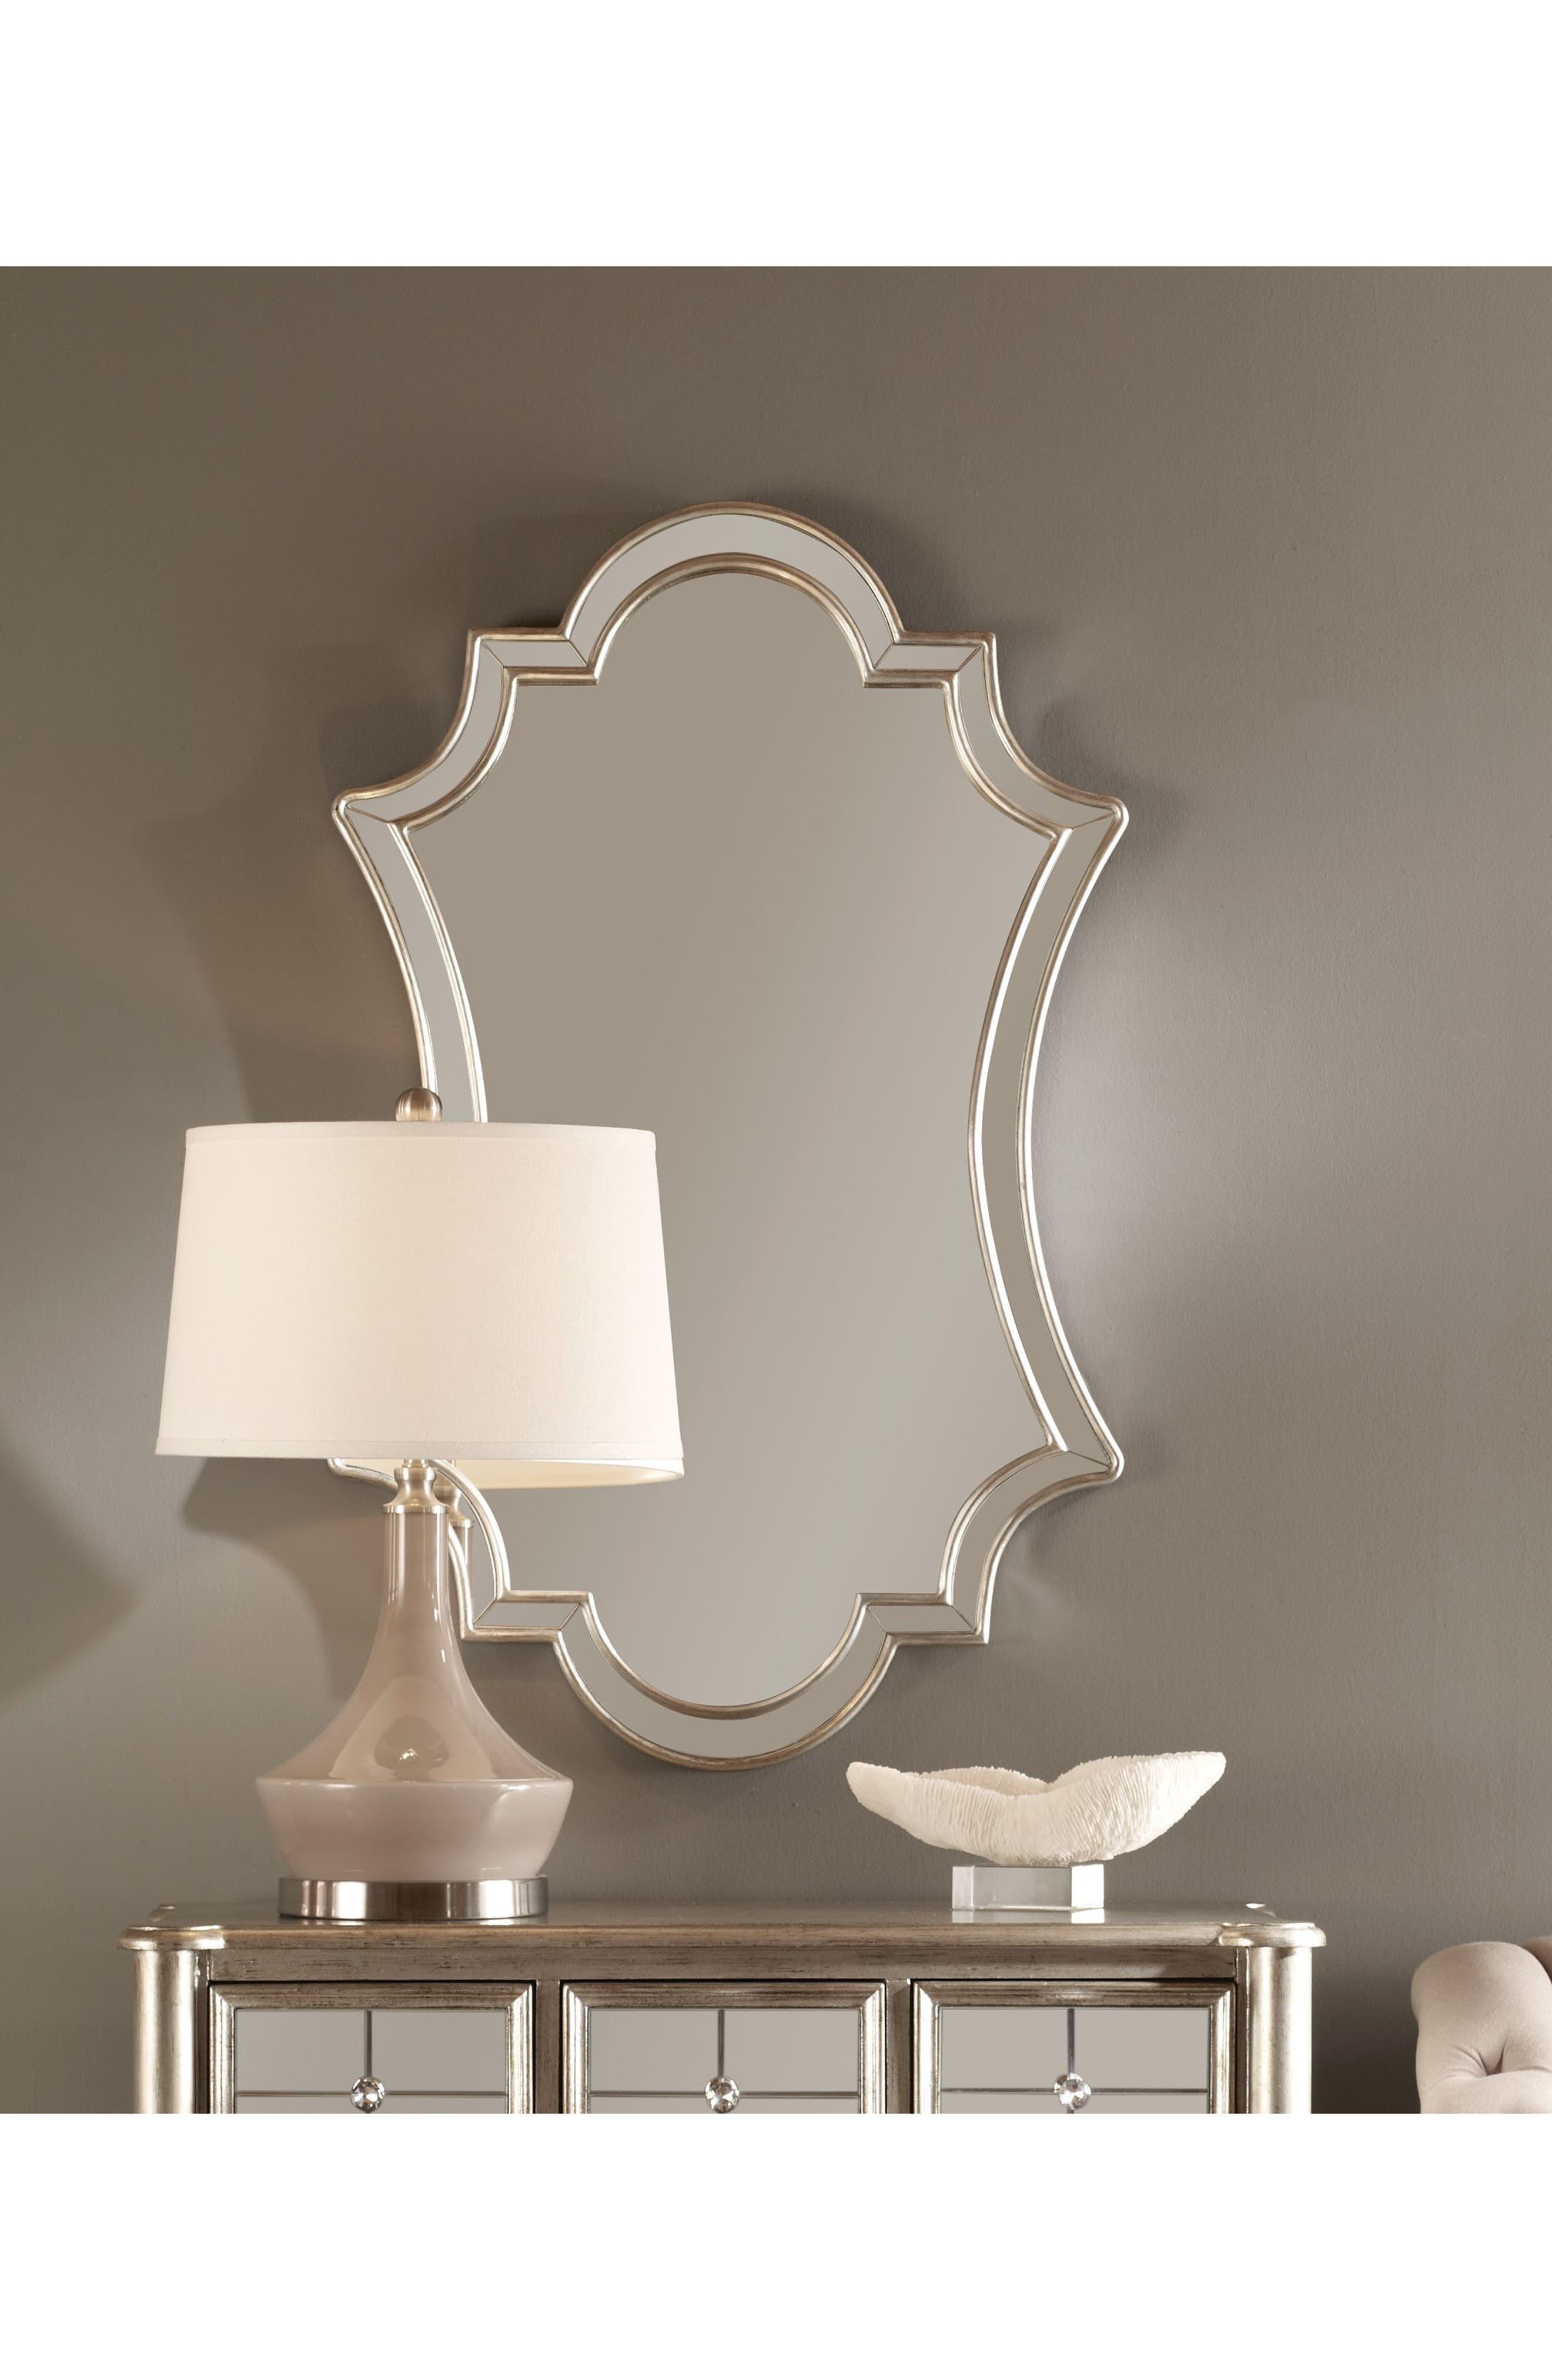 Elara Wall Mirror,                             Alternate thumbnail 3, color,                             020